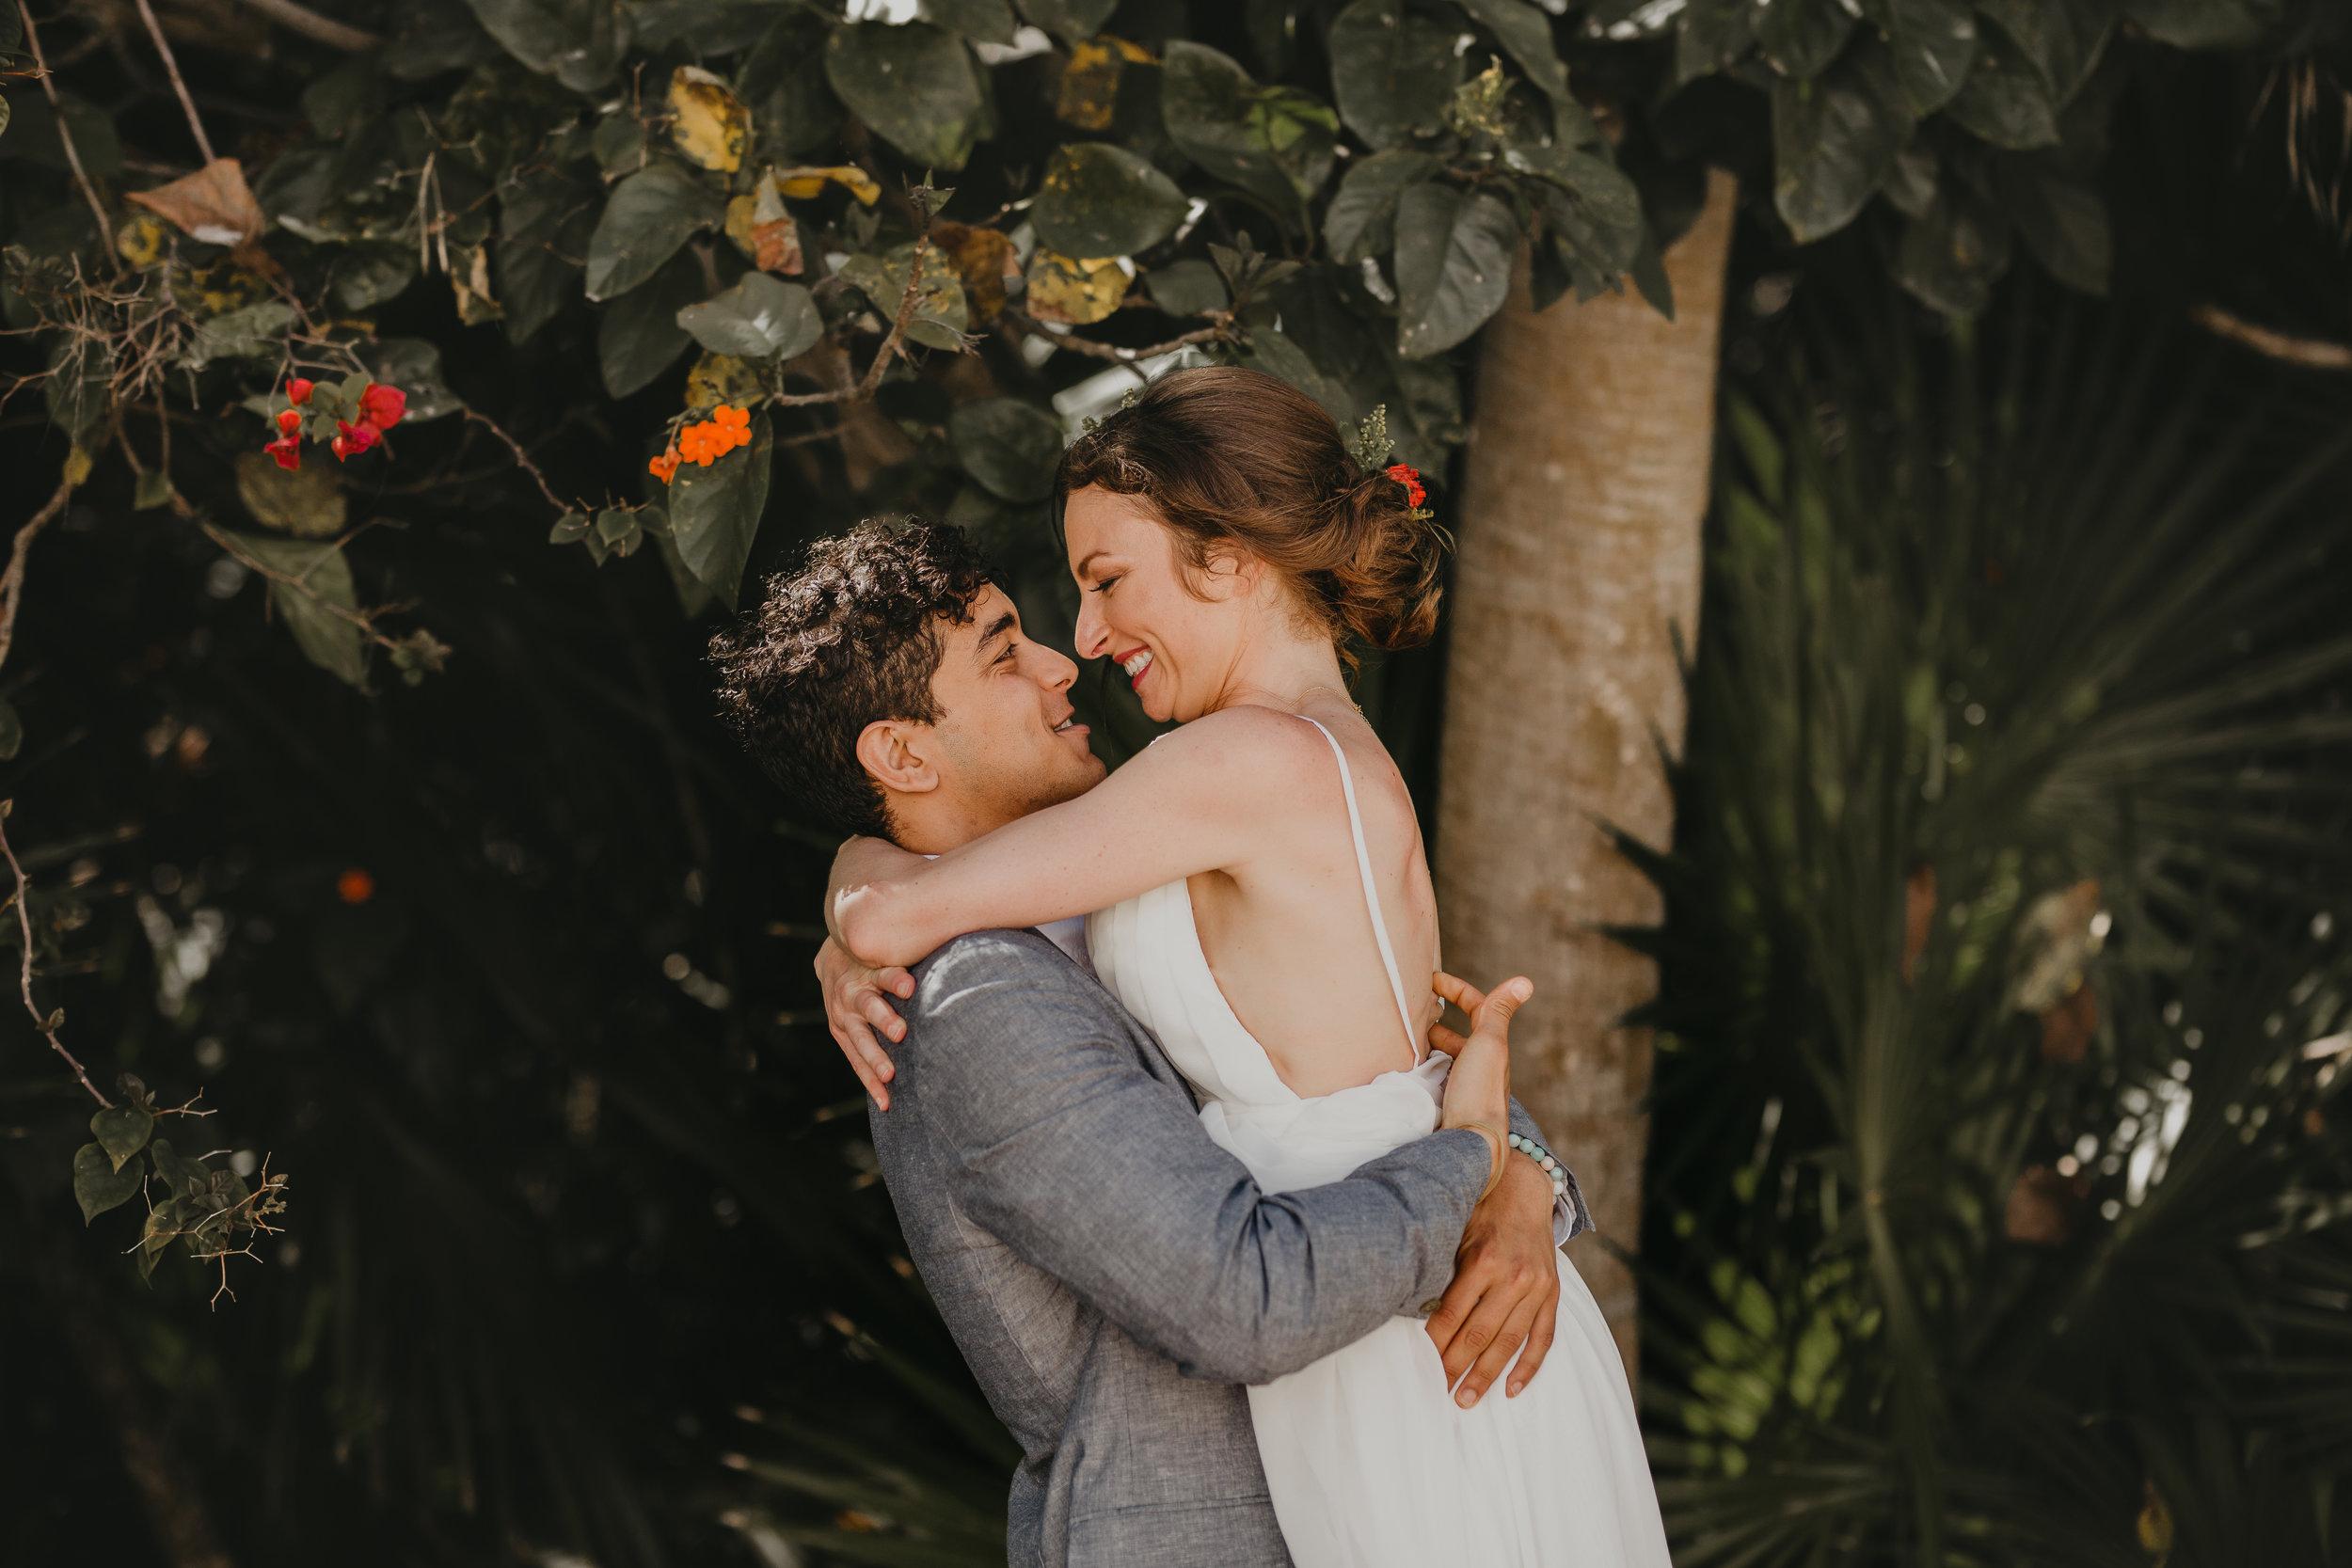 Nicole-Daacke-Photography-beachfront-akumal-destionation-wedding-tulum-mexico-elopement-photographer-destination-wedding-inspiration-sunset-champagne-pop-boho-bride-ocean-tropical-bohemian-tulum-wedding-photos-115.jpg